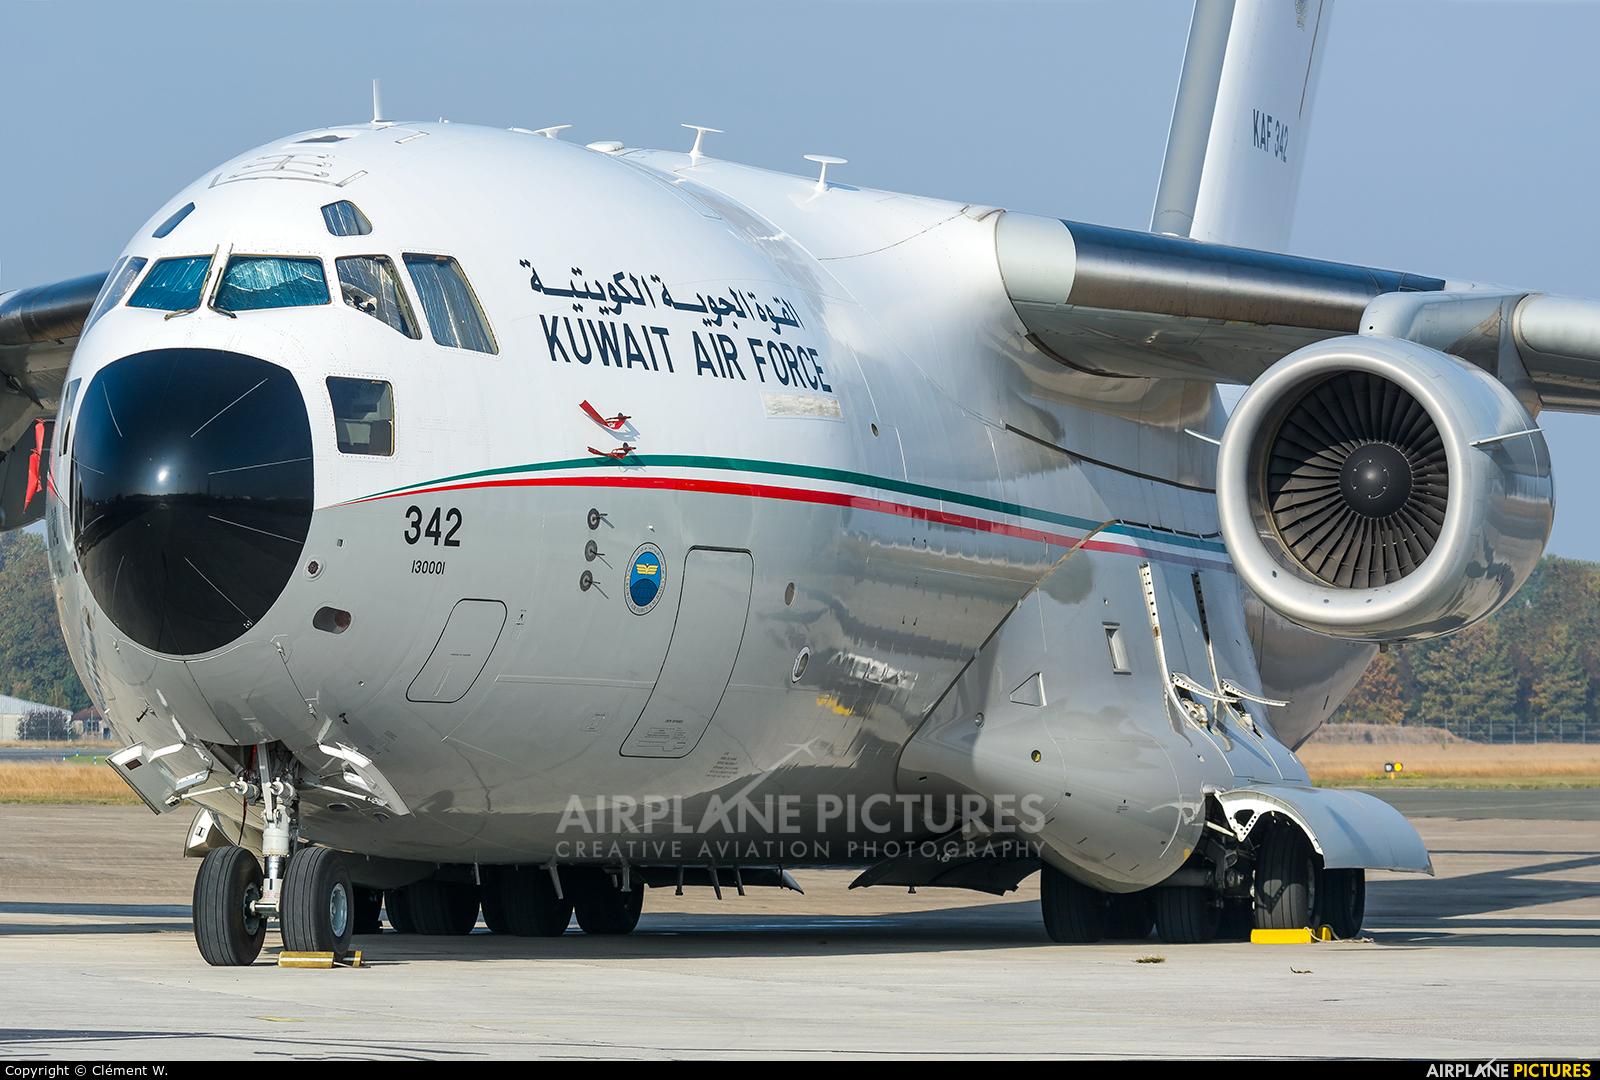 Kuwait - Air Force KAF342 aircraft at Paris - Le Bourget